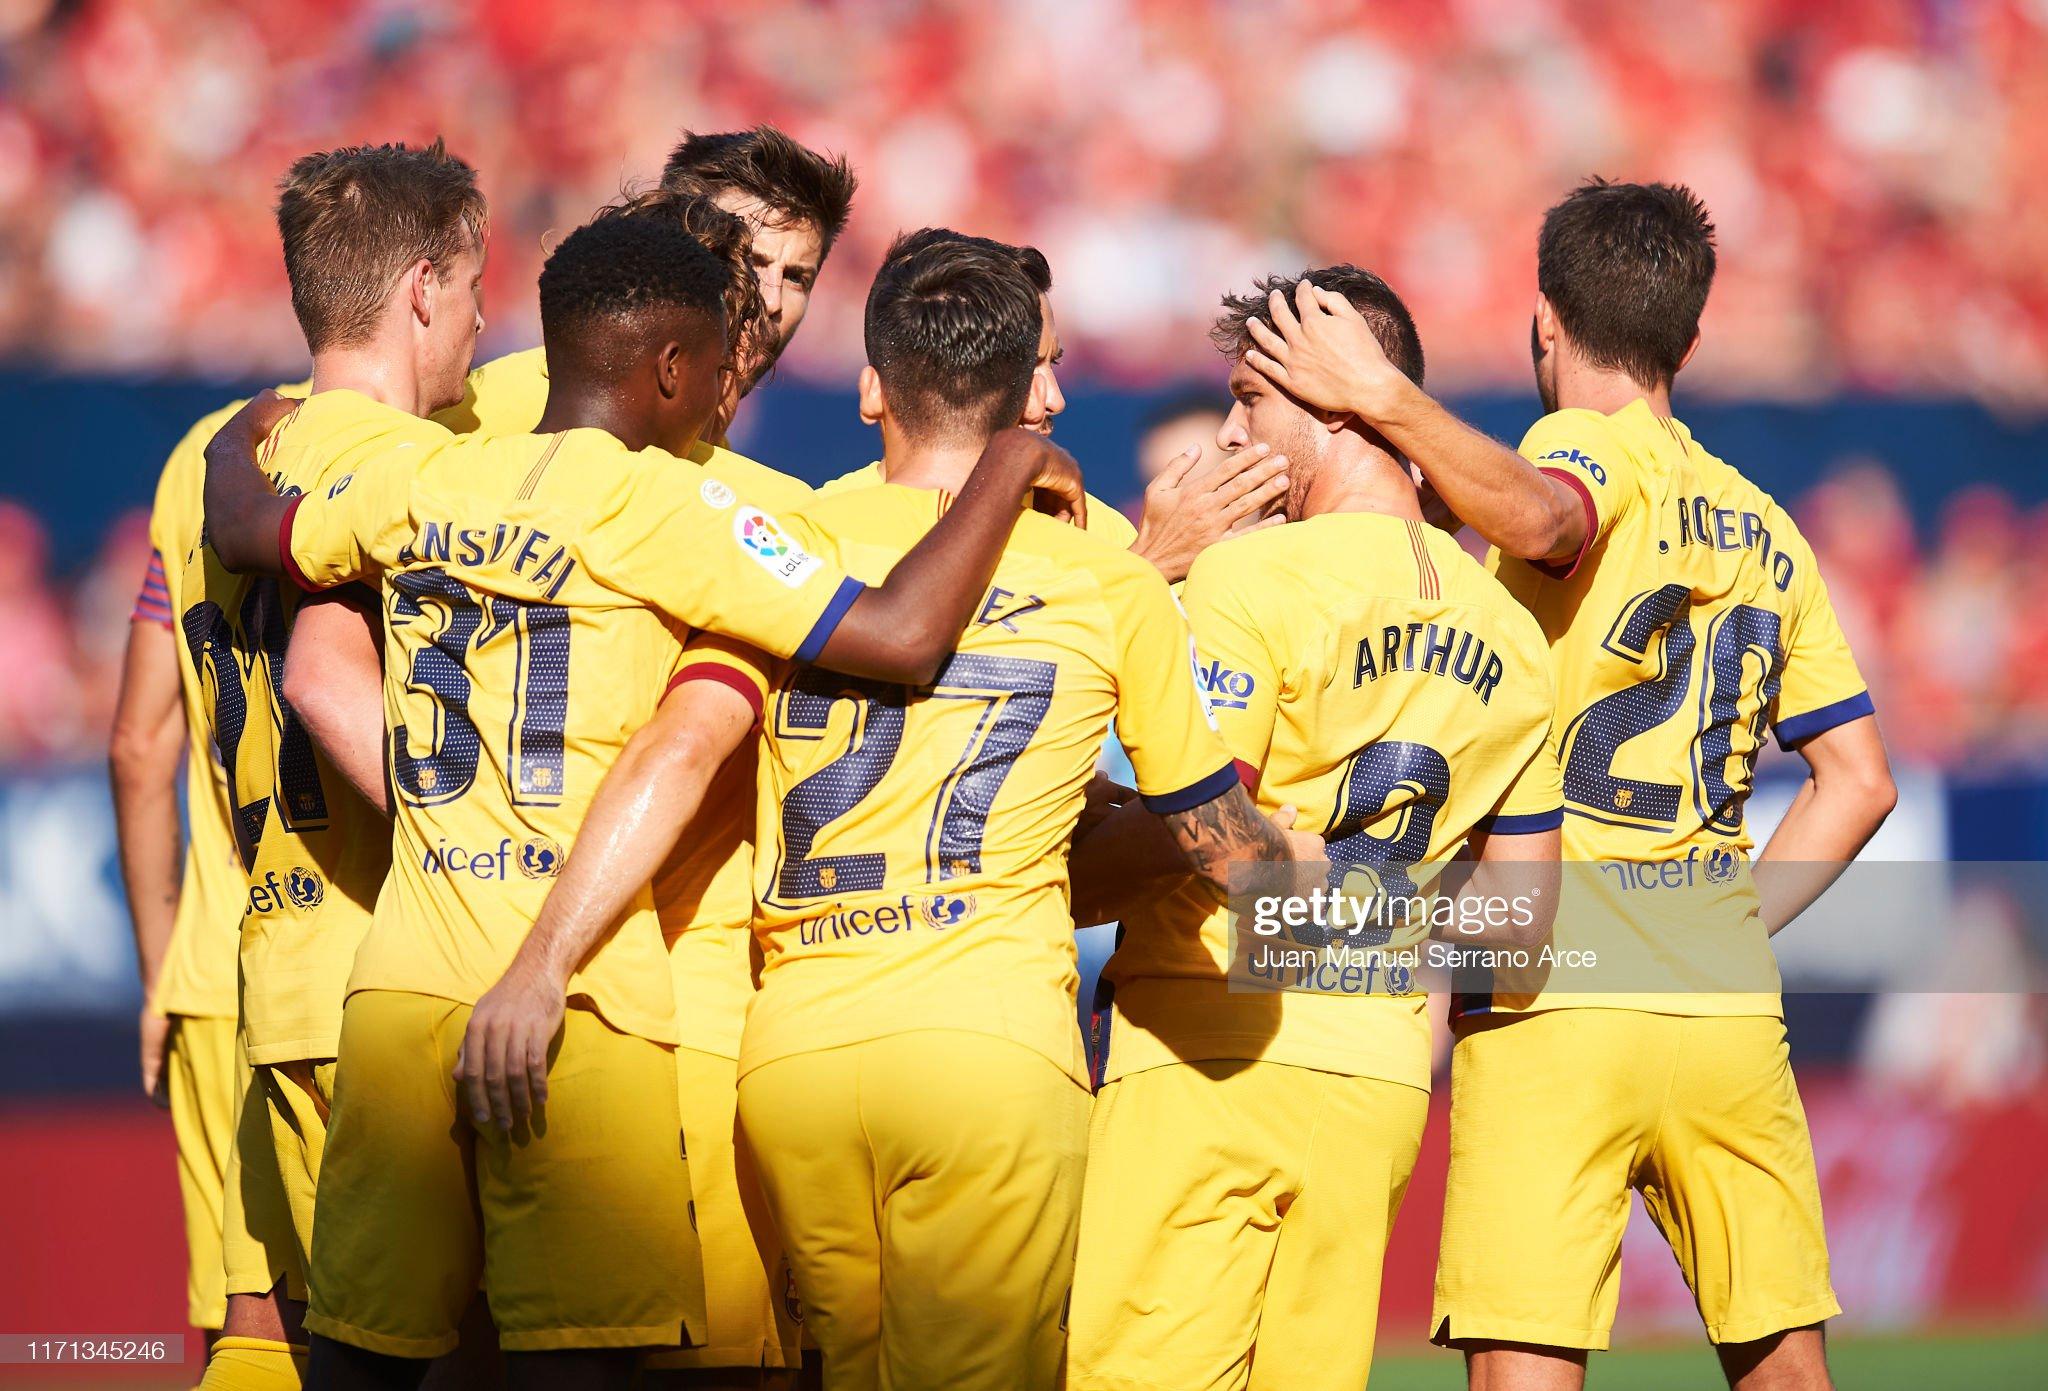 صور مباراة : أوساسونا - برشلونة 2-2 ( 31-08-2019 )  Arthur-melo-of-fc-barcelona-celebrates-with-teammates-after-scoring-picture-id1171345246?s=2048x2048